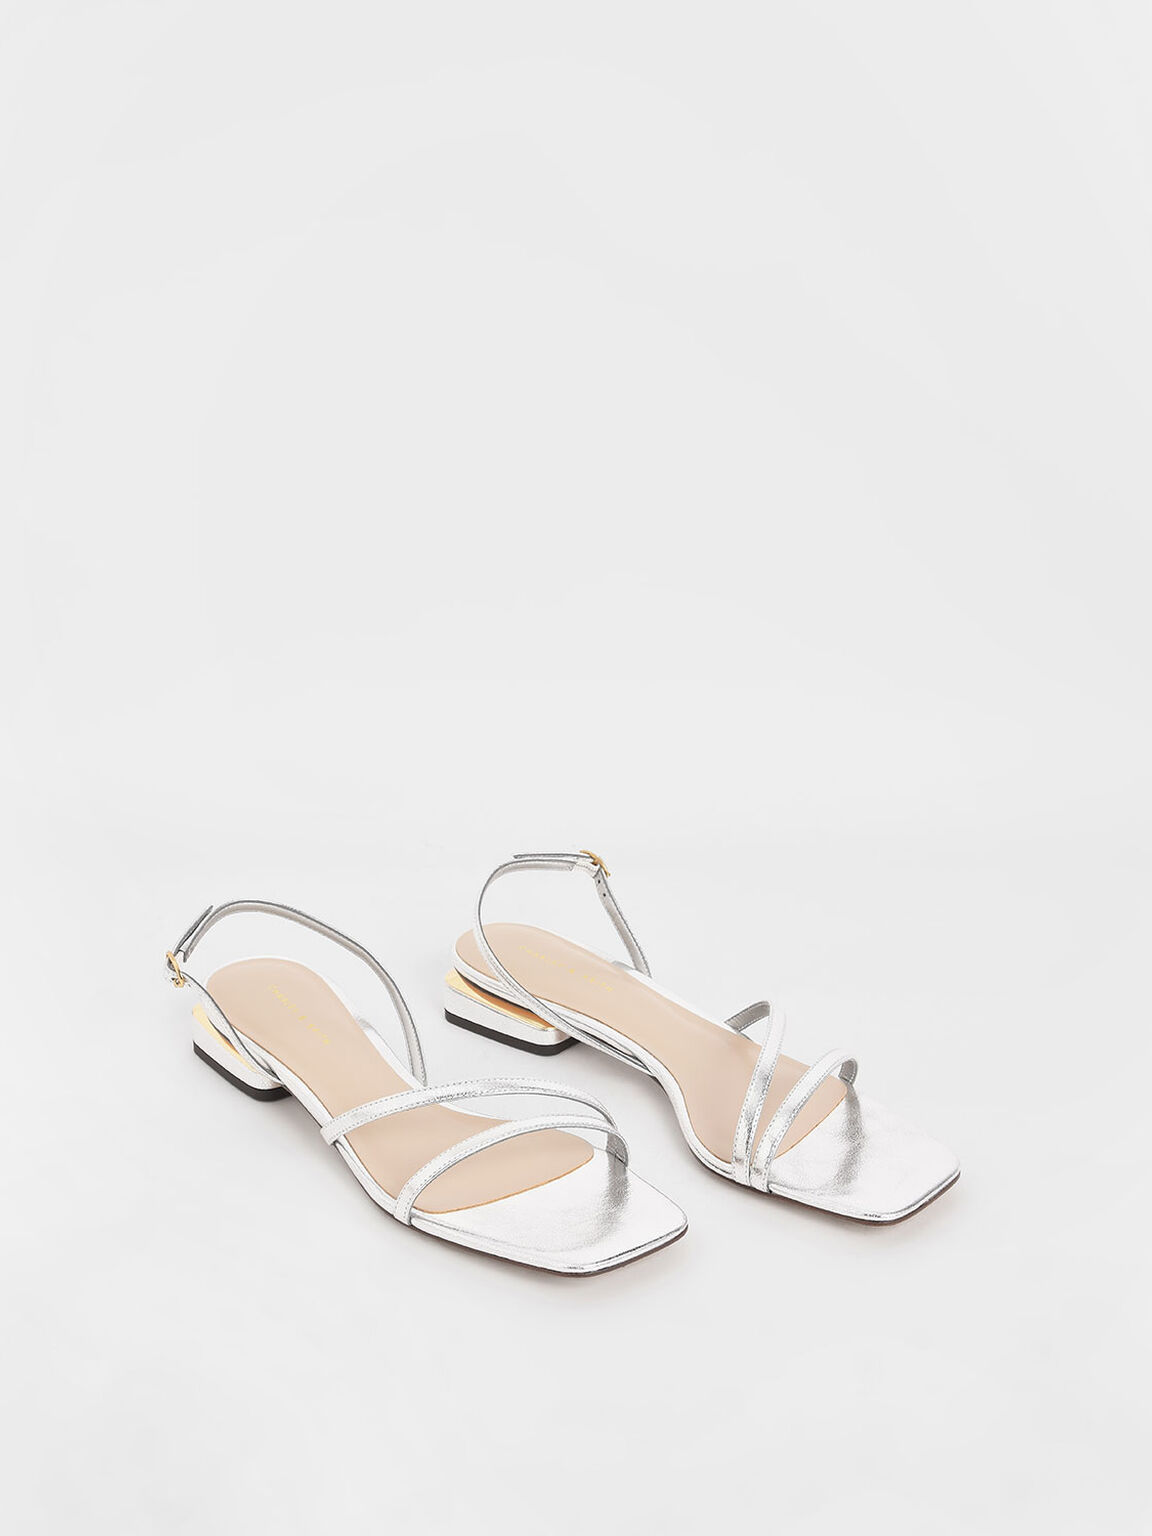 Metallic Strappy Slingback Heels, Silver, hi-res